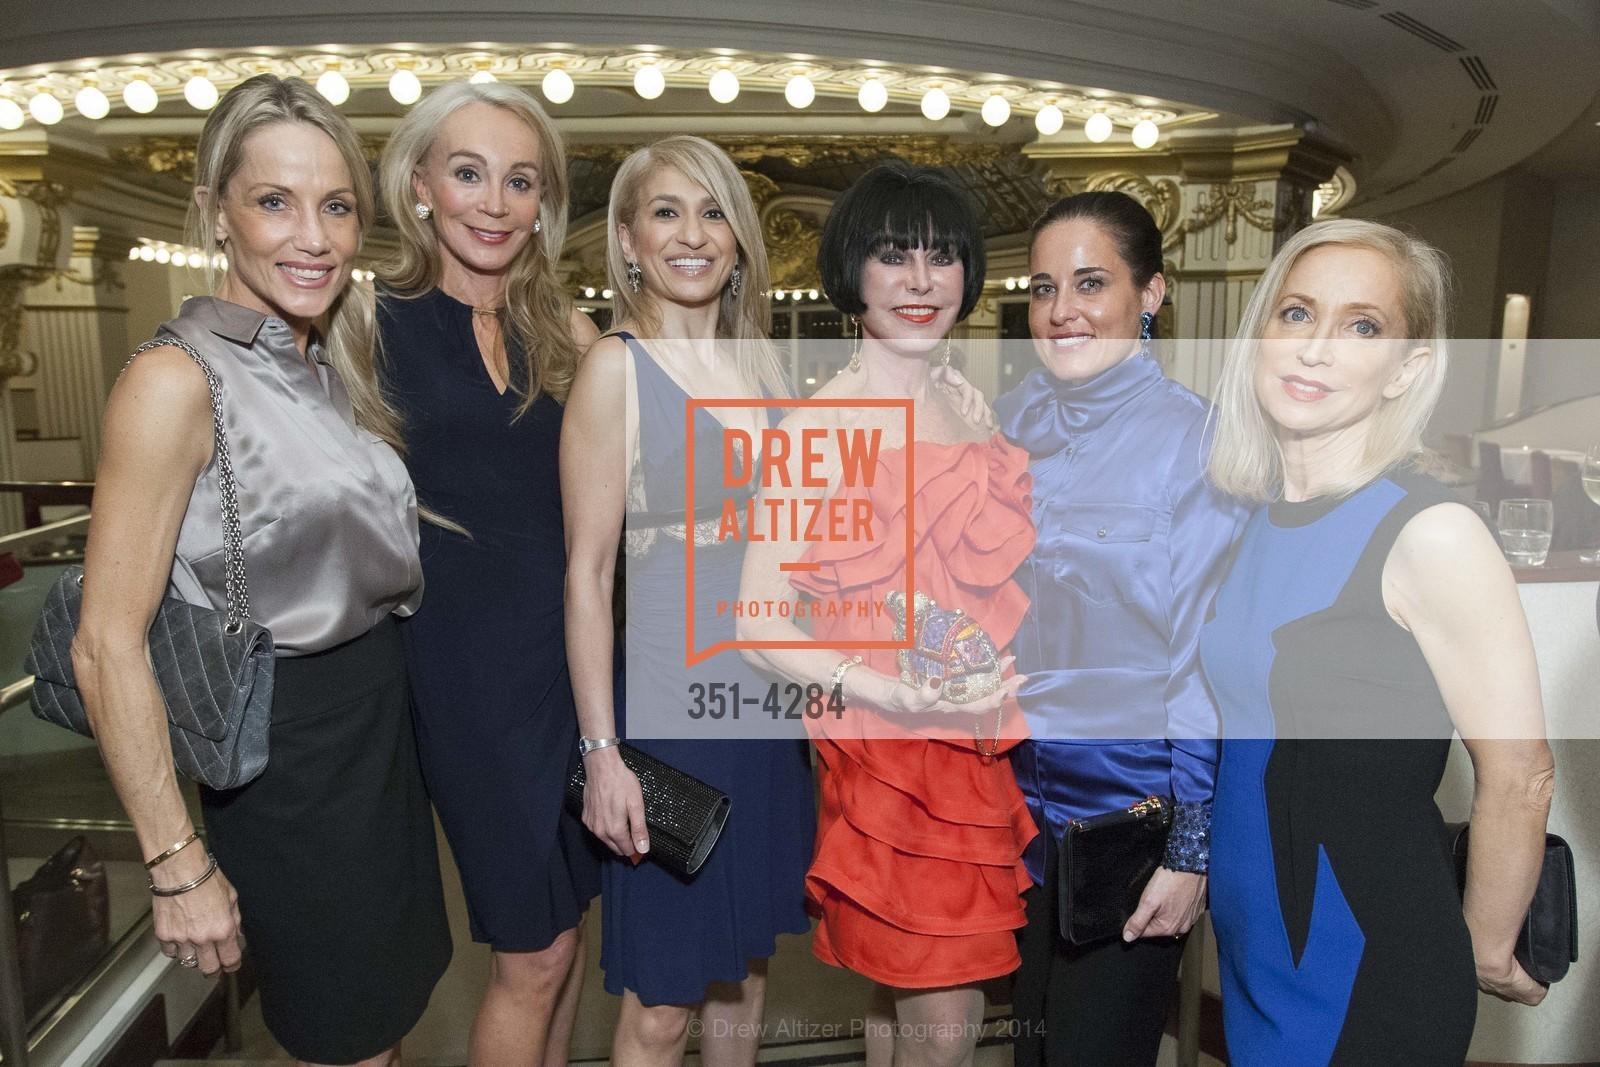 Beverly Aigen, Giselle Farris, Navid Armstrong, Marilyn Cabak, Natalia Urrutia, Shelley Gordon, Photo #351-4284